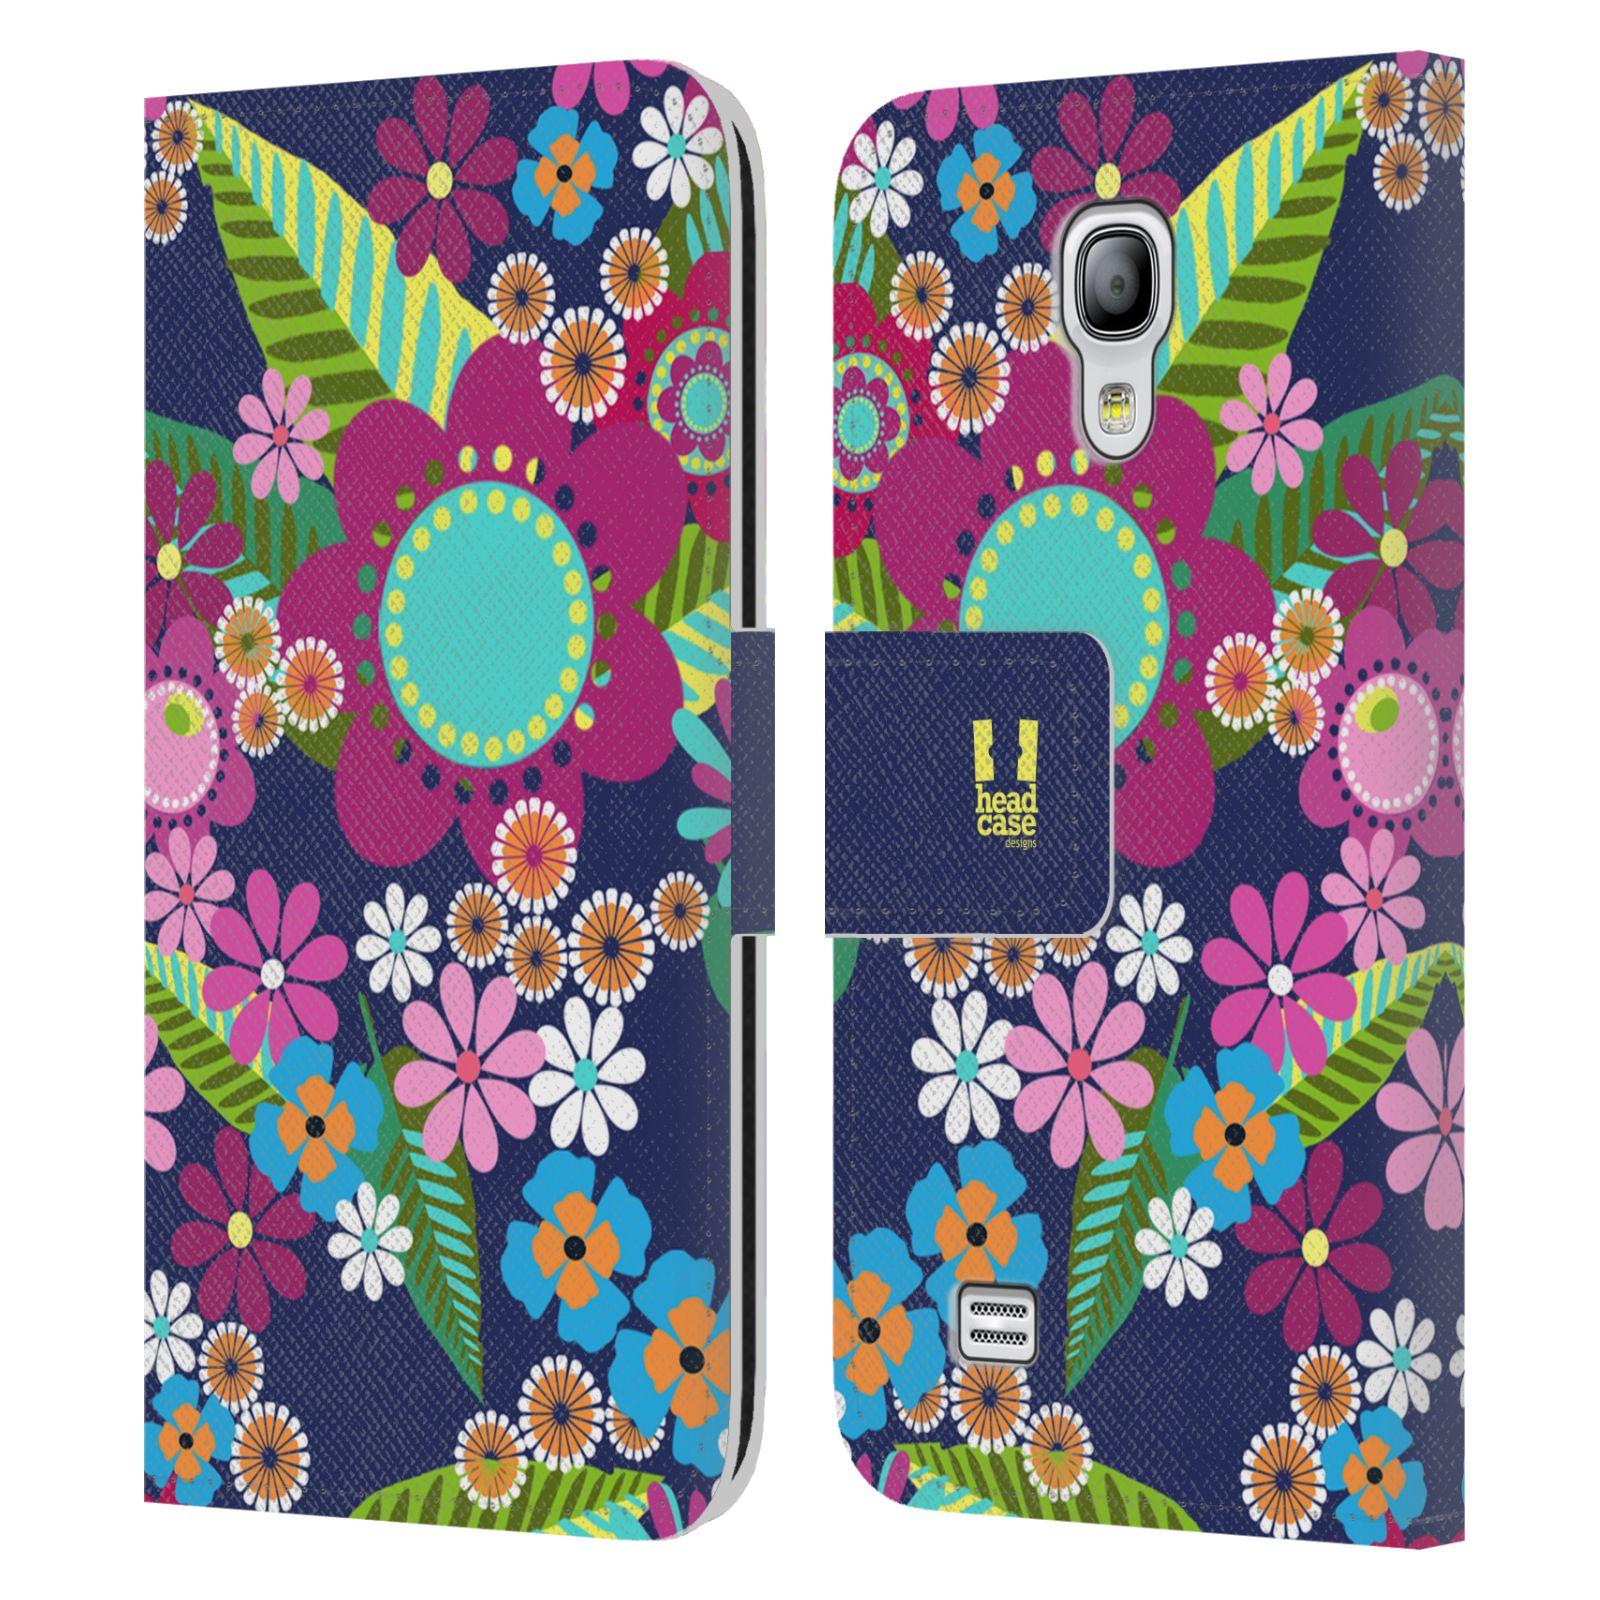 HEAD CASE Flipové pouzdro pro mobil Samsung Galaxy S4 MINI / S4 MINI DUOS BOTANIKA barevné květy modrá